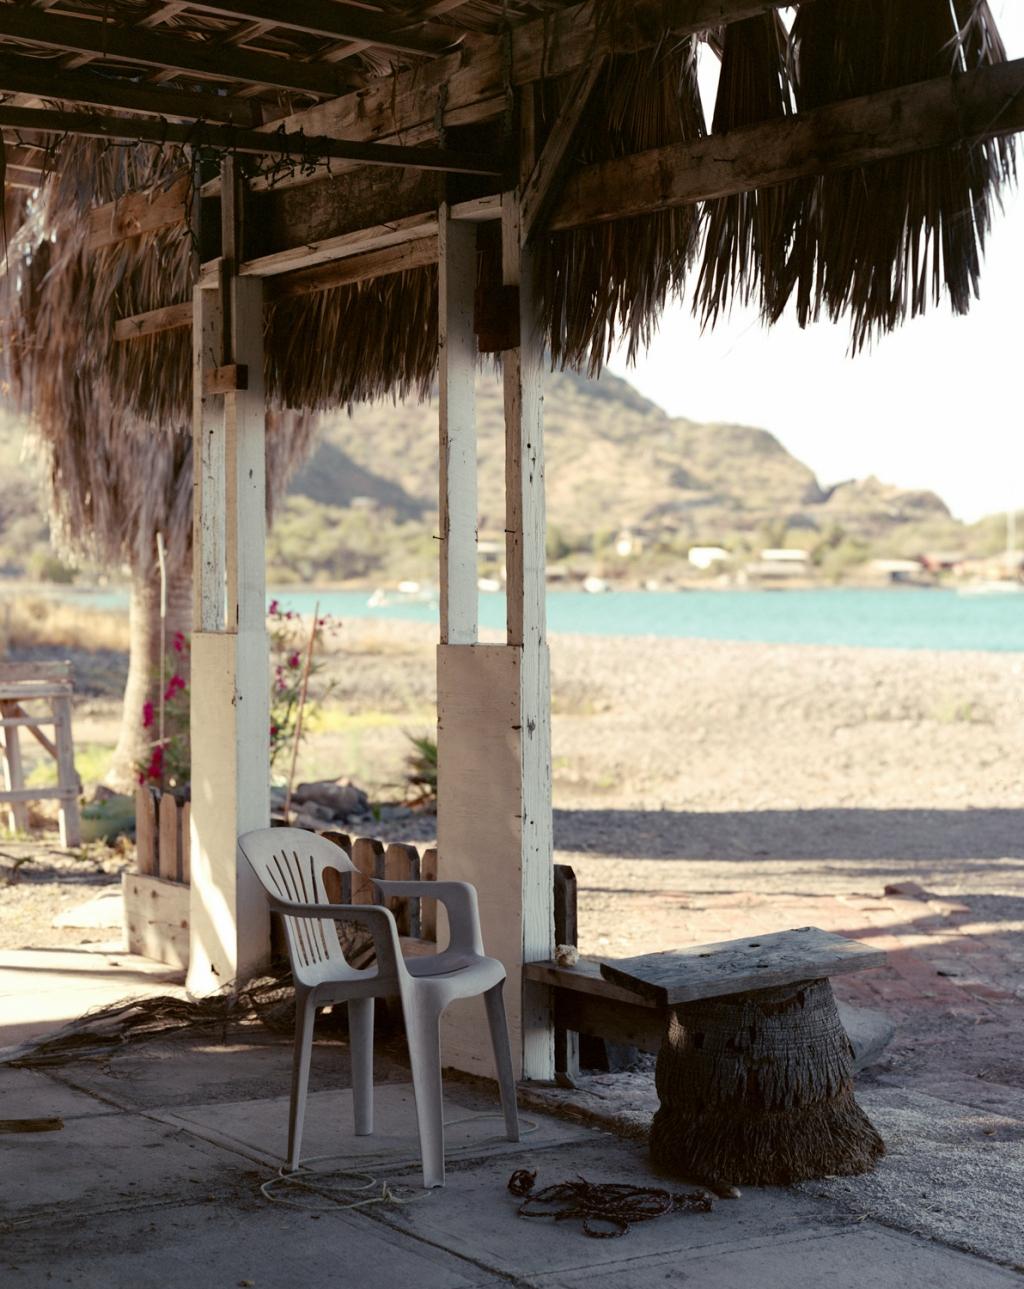 FRANÇOIS CAVELIER Oasis Península. Baja California Sur. Mexico